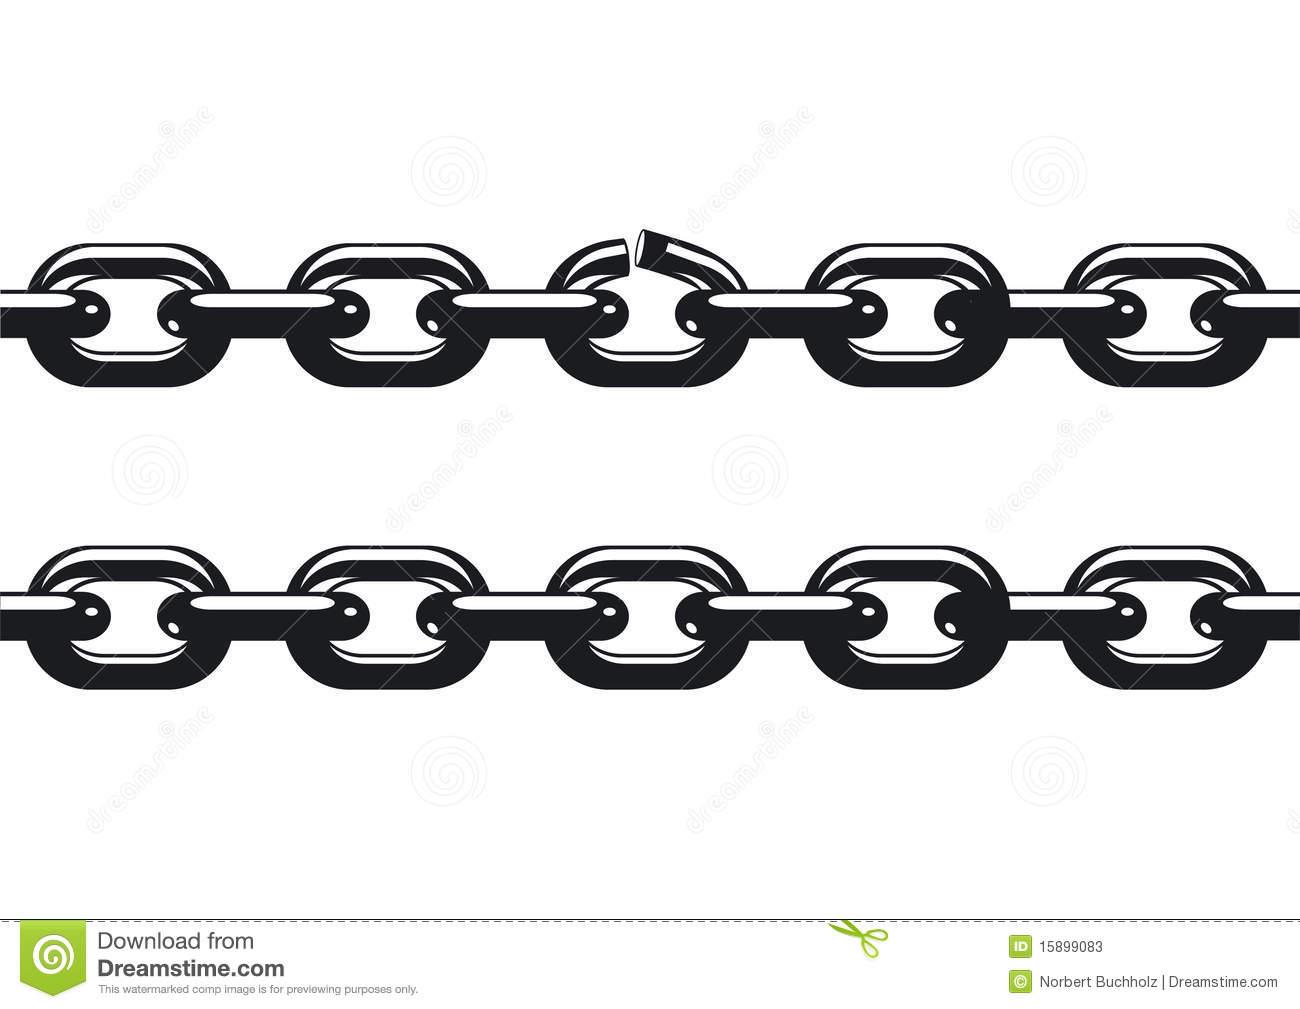 1300x1009 Tow Chain